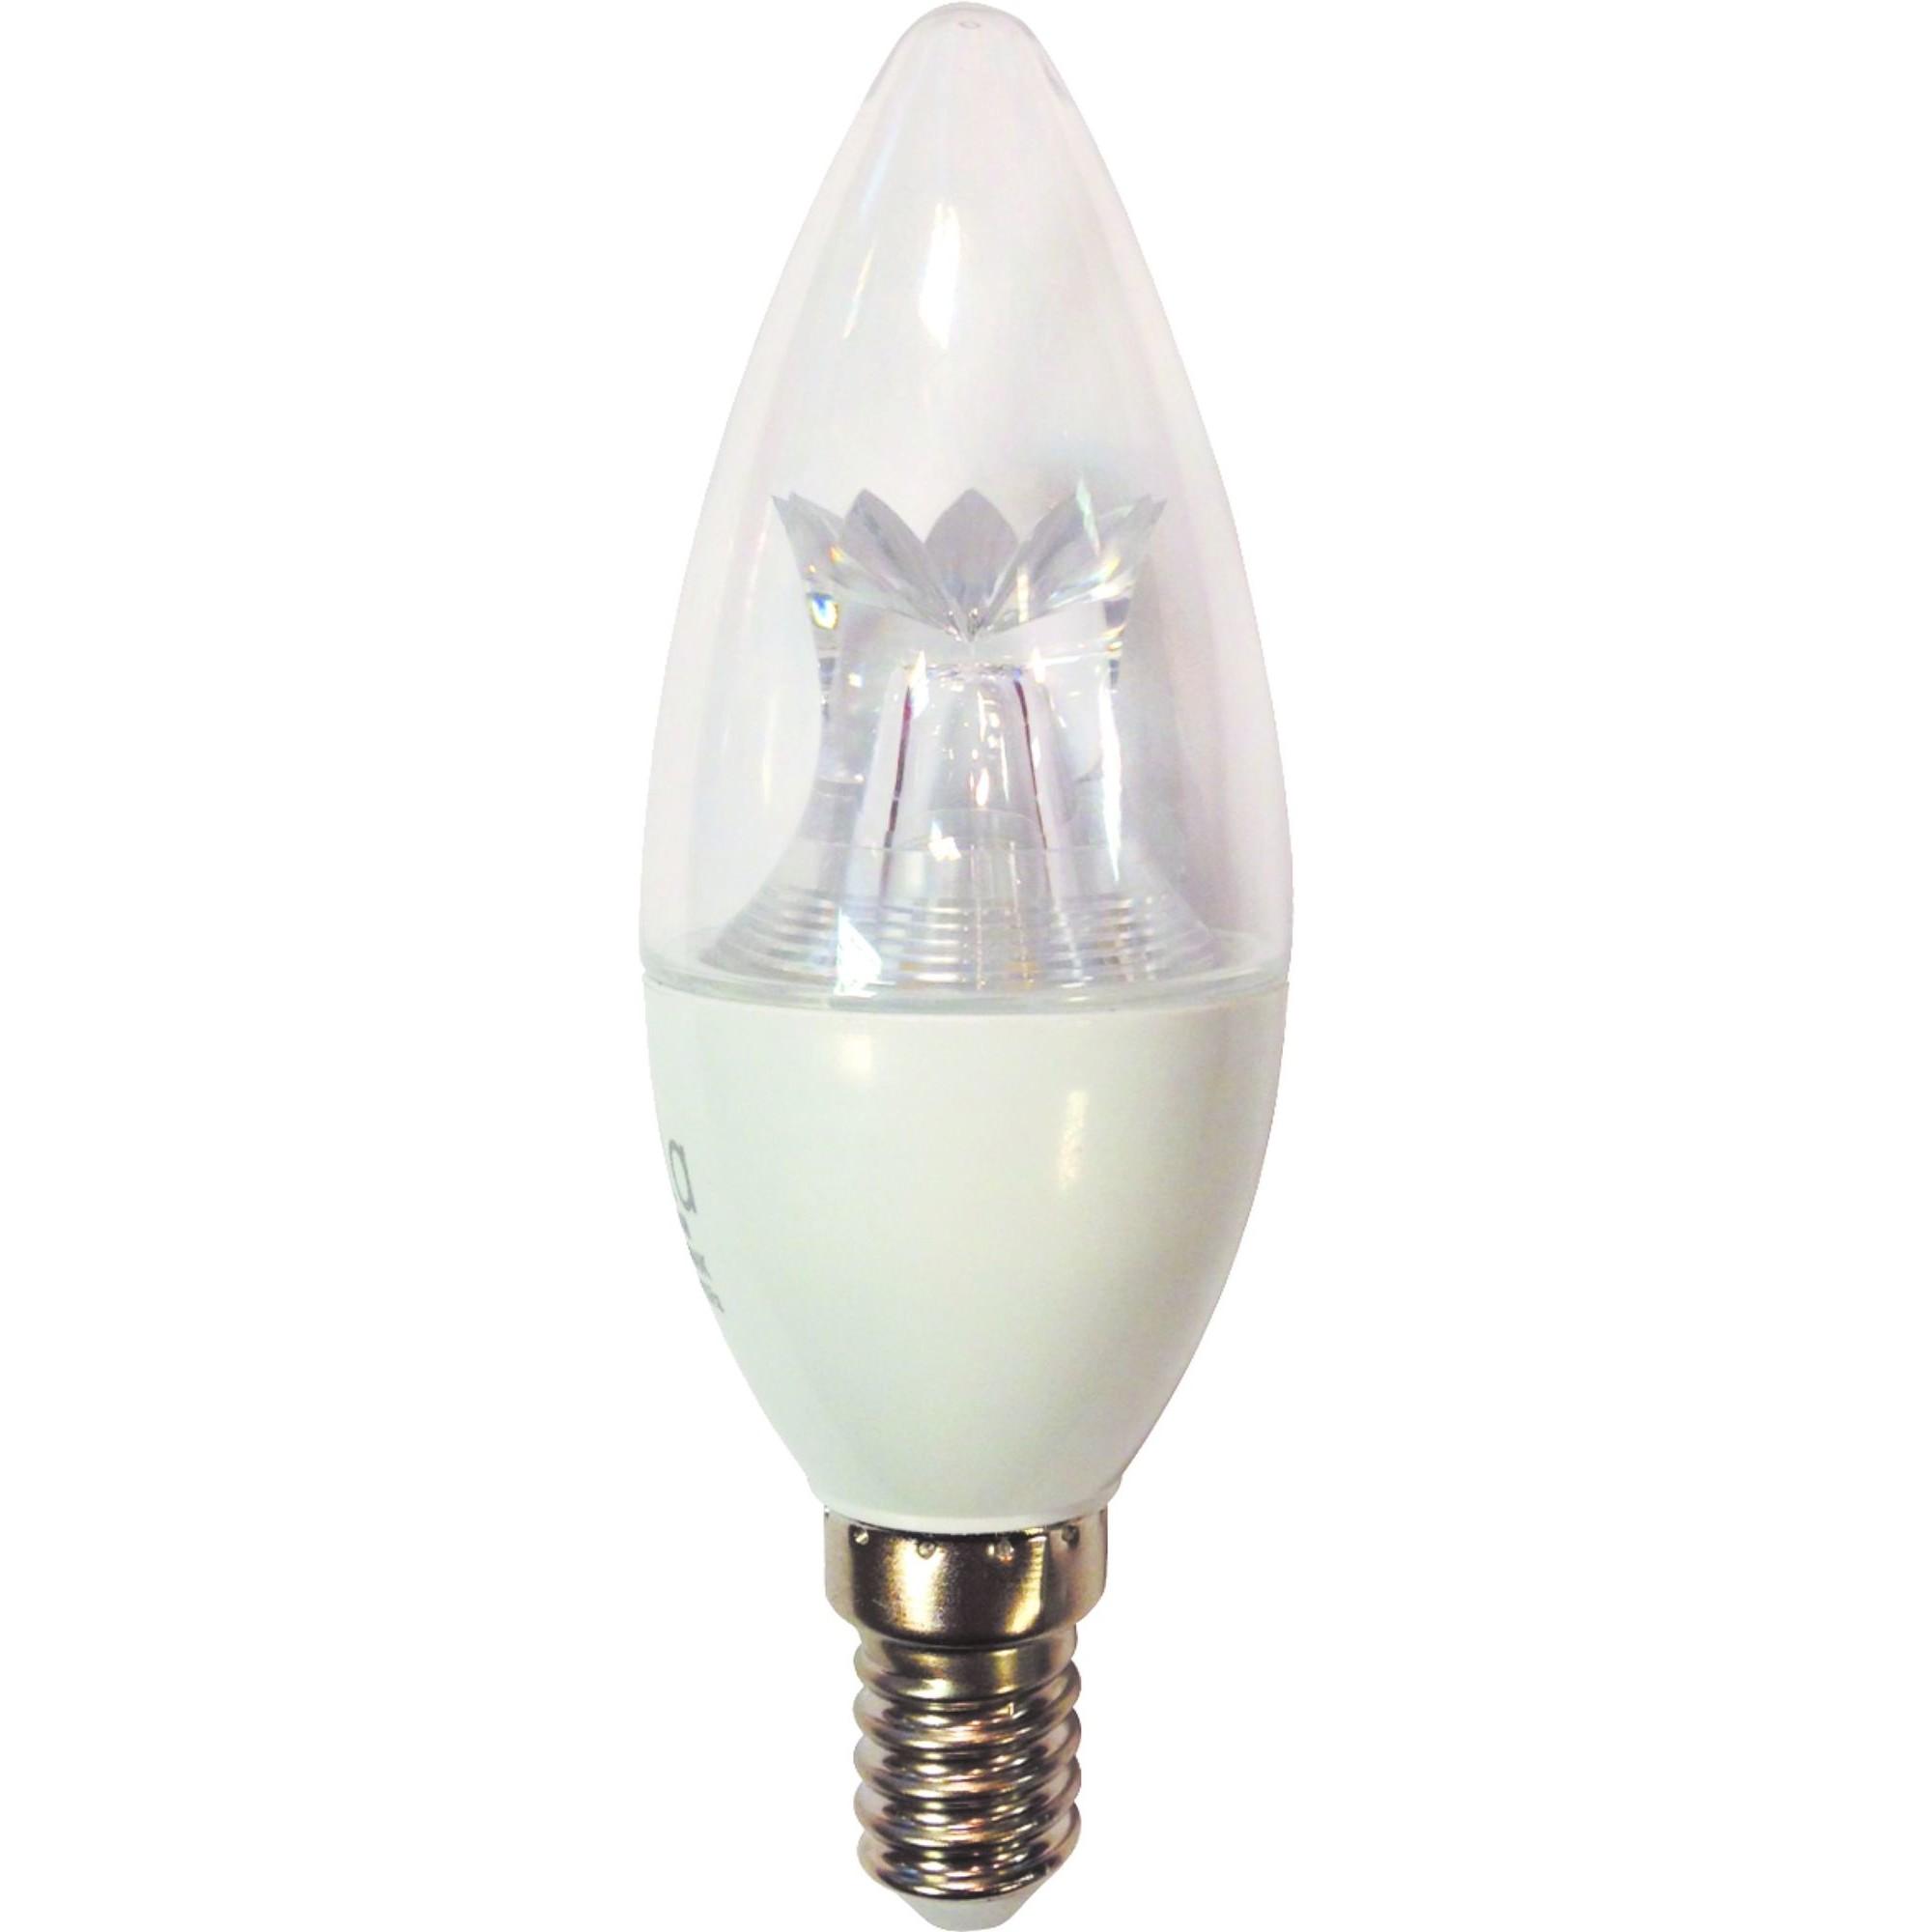 Лампа Ecola Premium светодионая E14 7 Вт свеча 595 Лм теплый свет